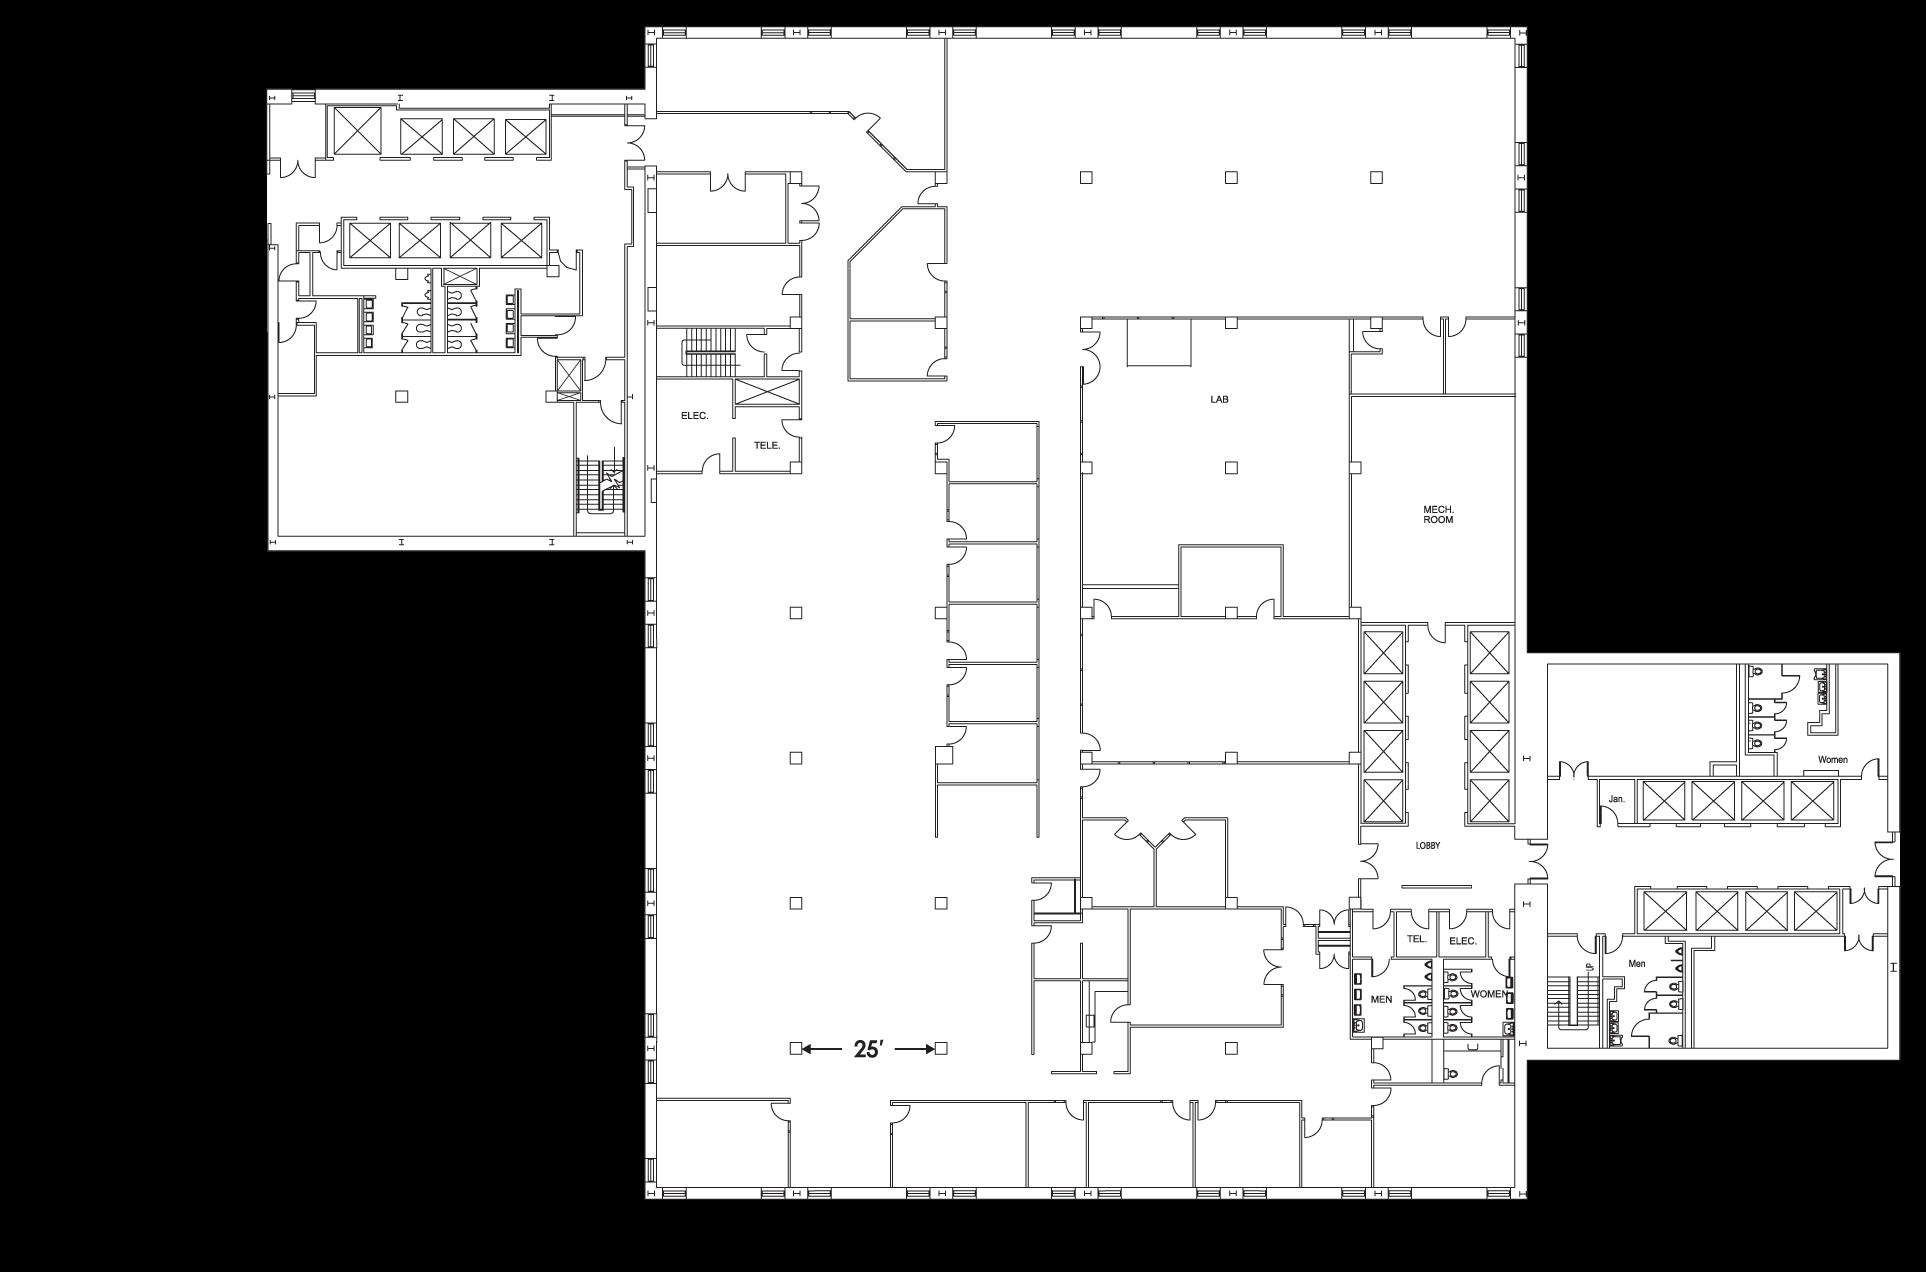 Tower 2 Floor 7 Floorplan Image